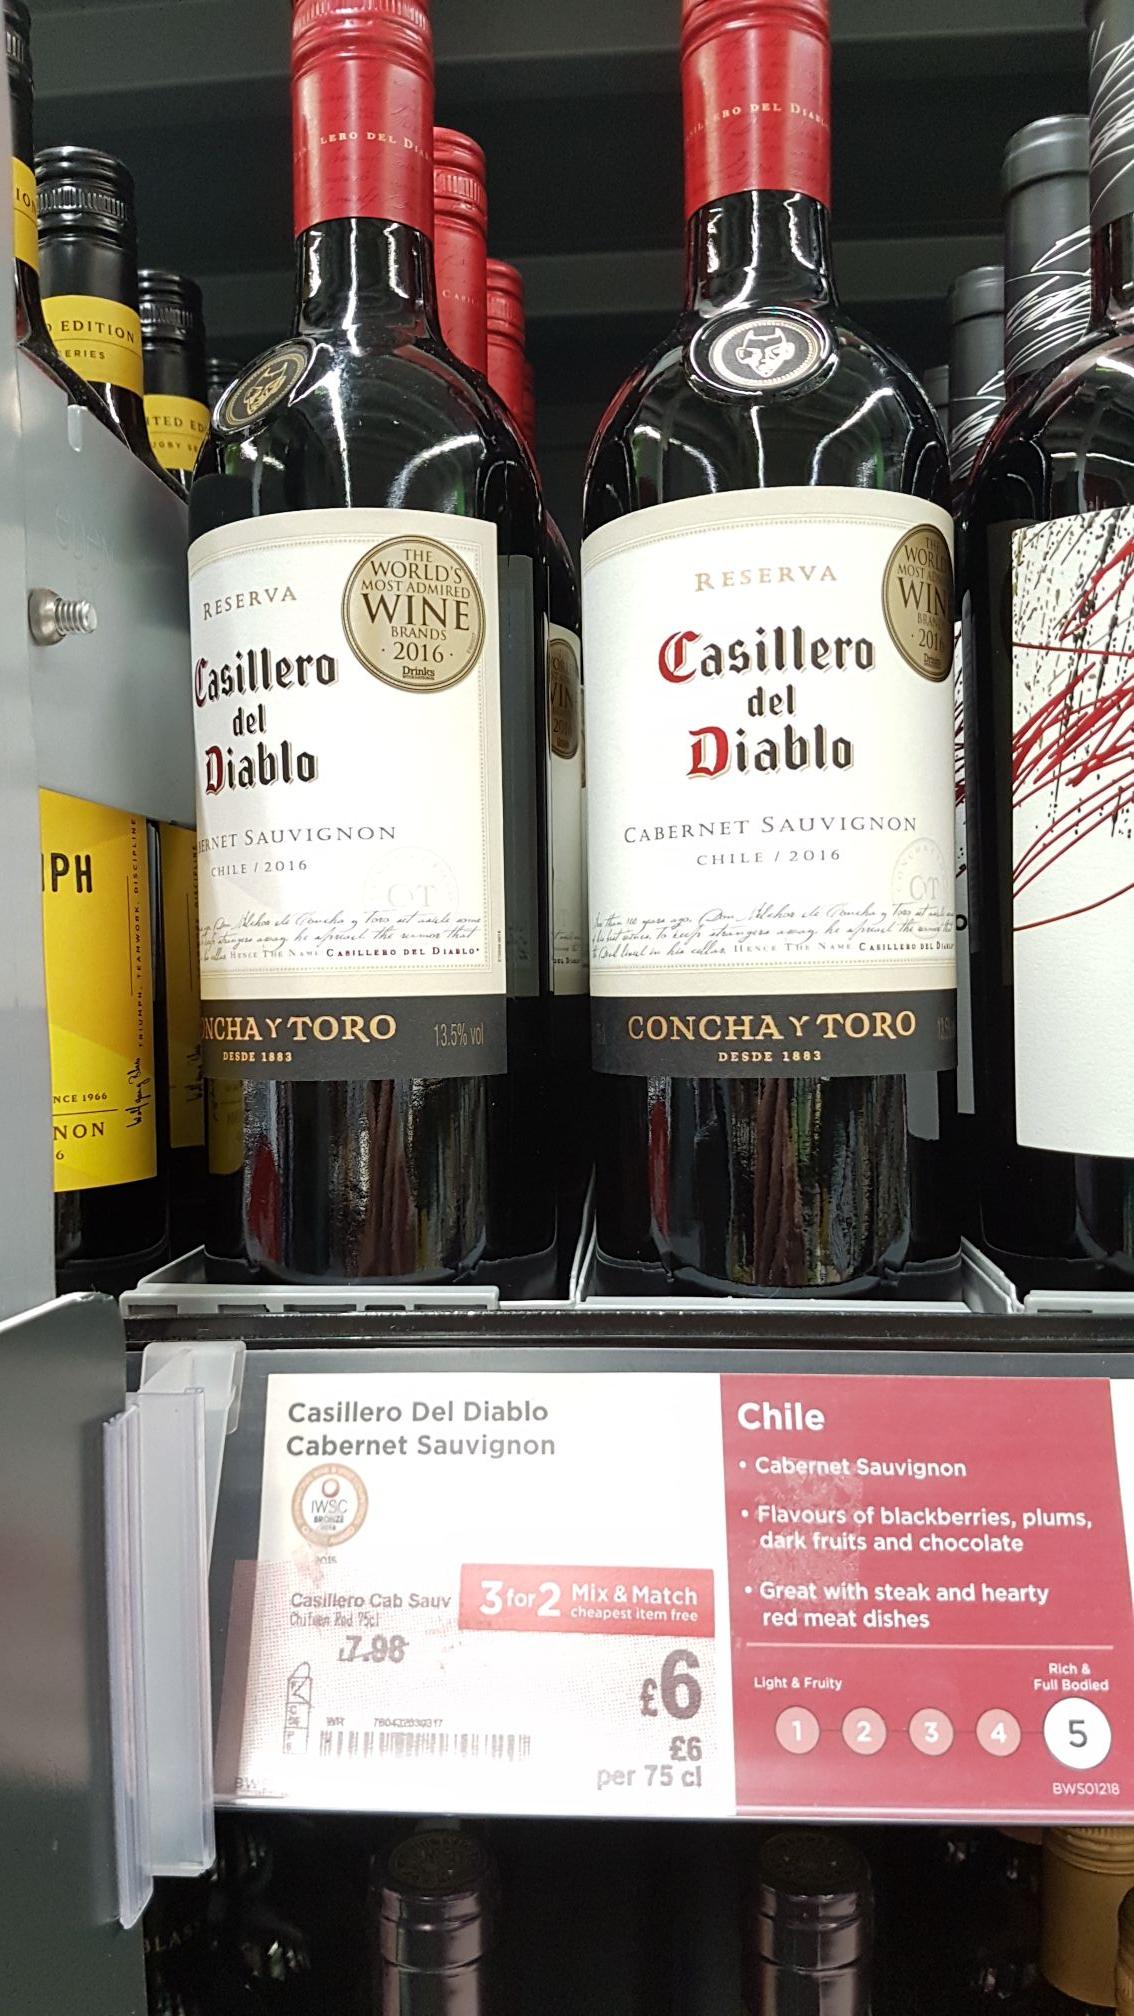 Casillero del Diablo Cabernet Sauvignon or Sauvignon Blanc 3 bottles for £12 @ ASDA